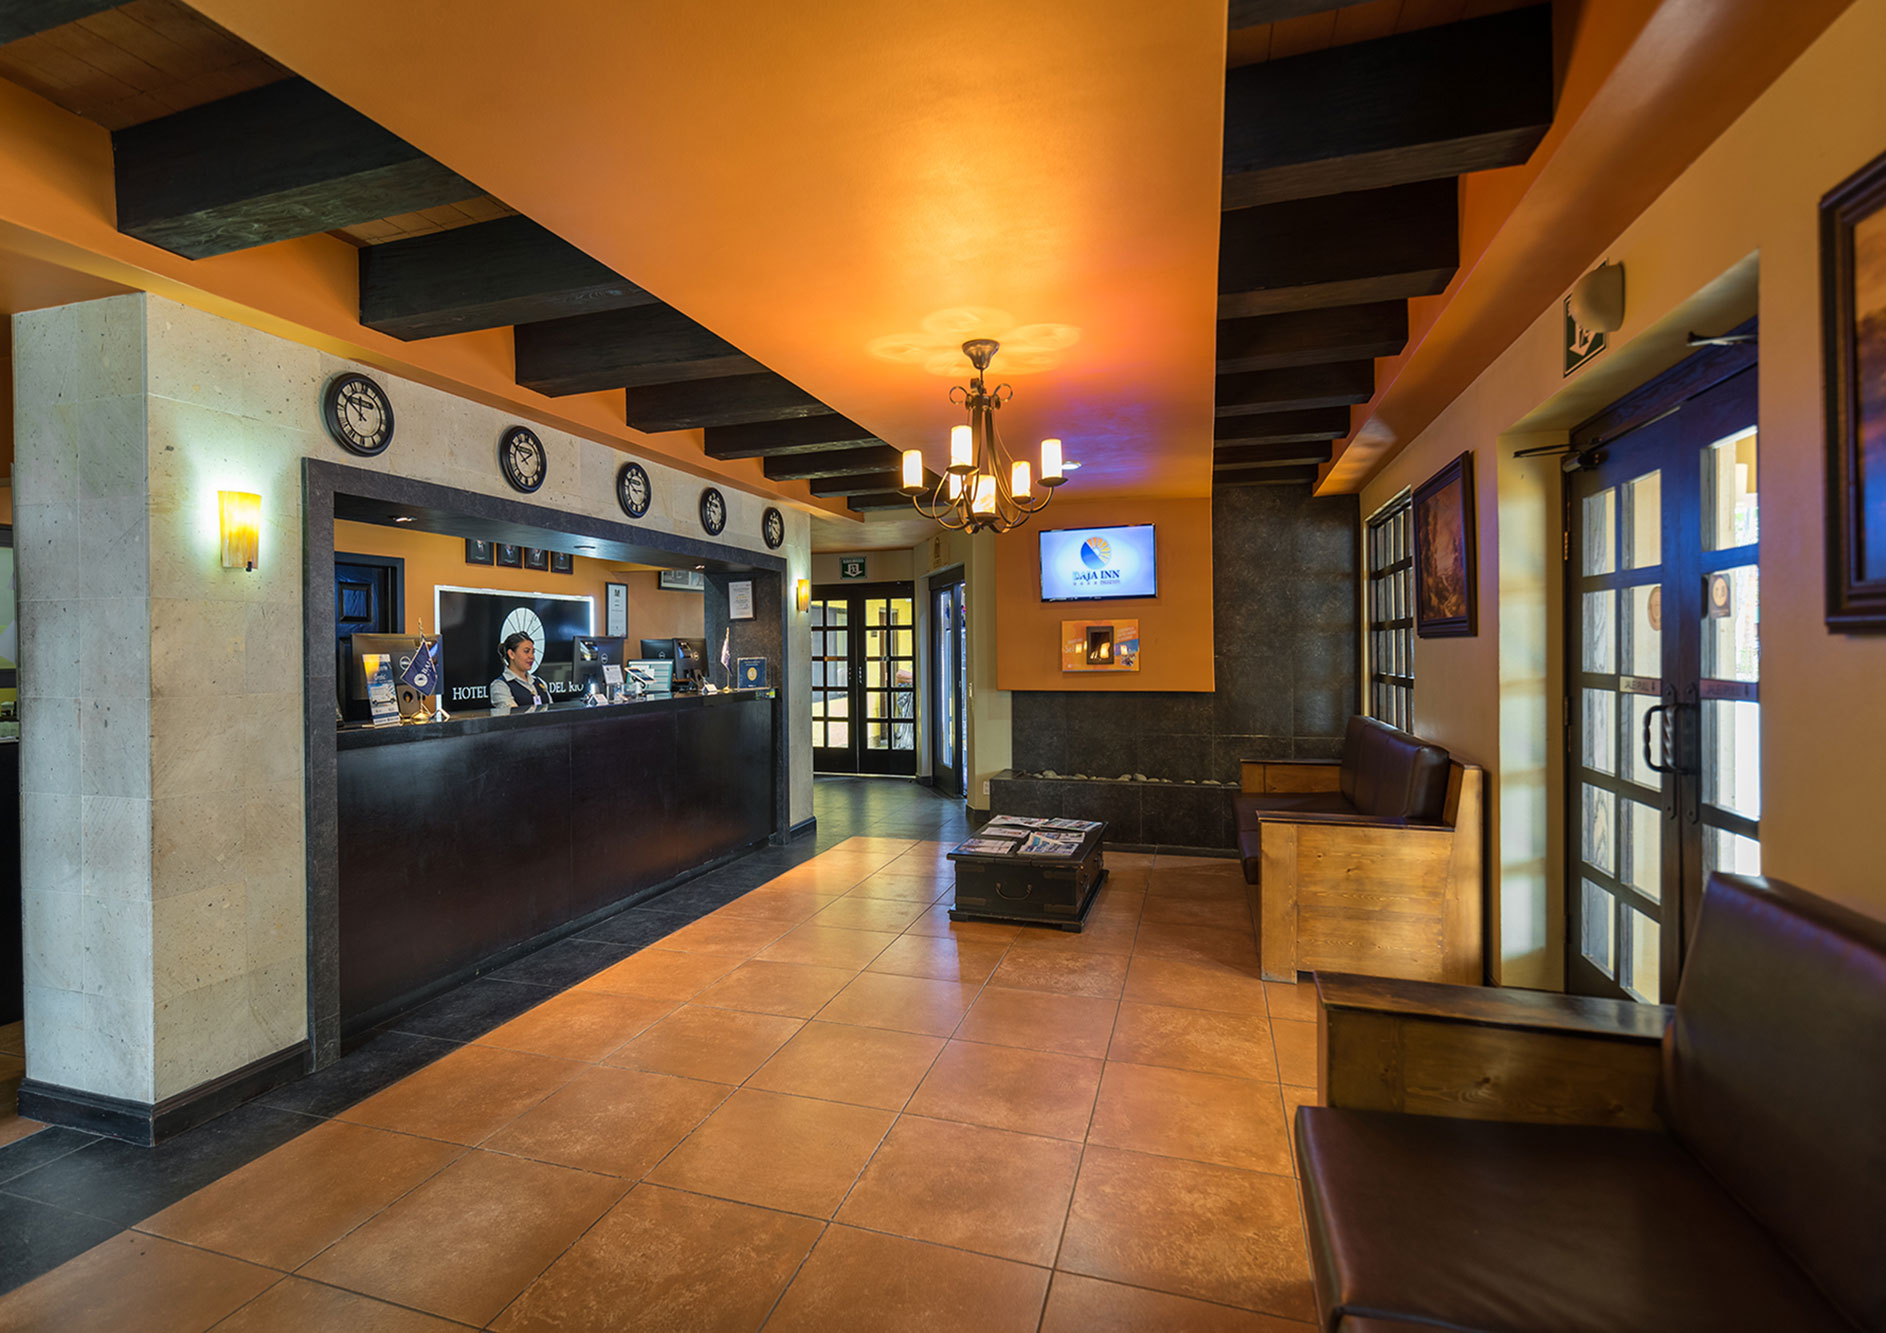 recepcion hotel tijuana